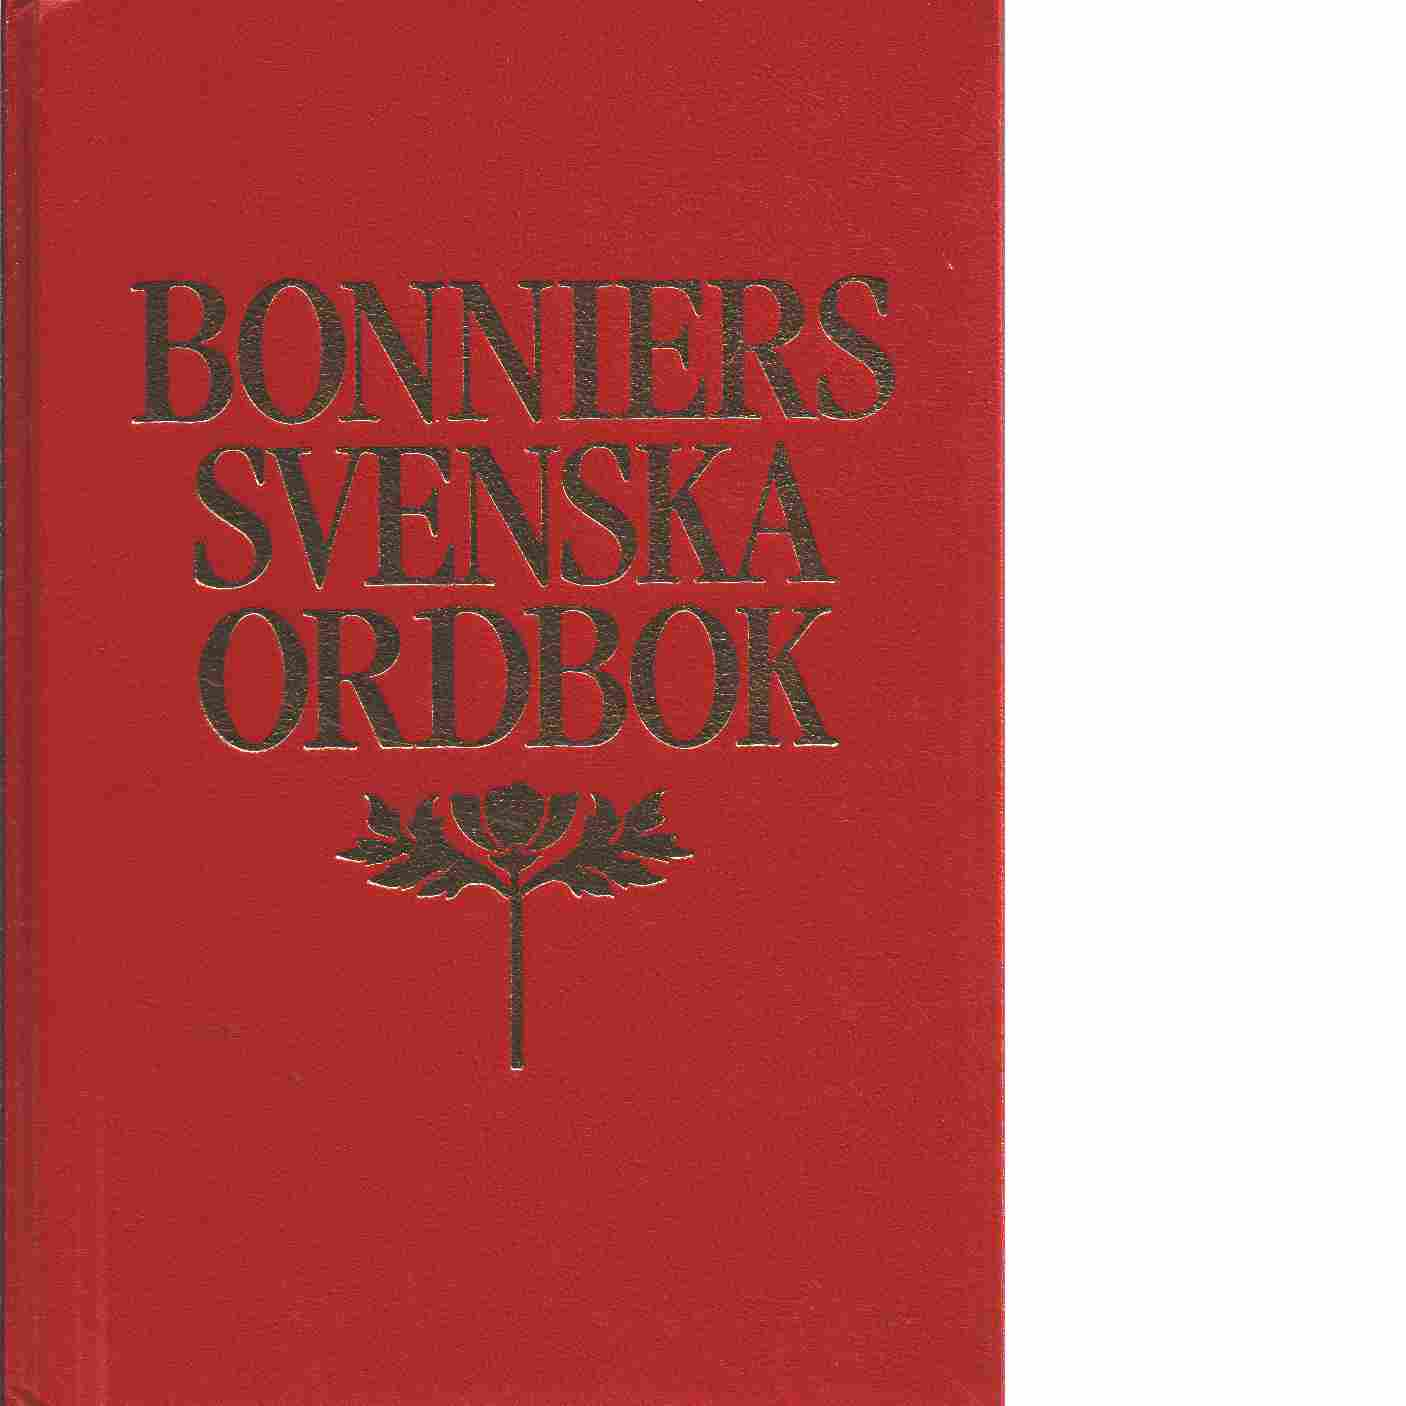 Bonniers svenska ordbok - Malmström, Sten och Sjögren, Peter A  samt Györki, Iréne